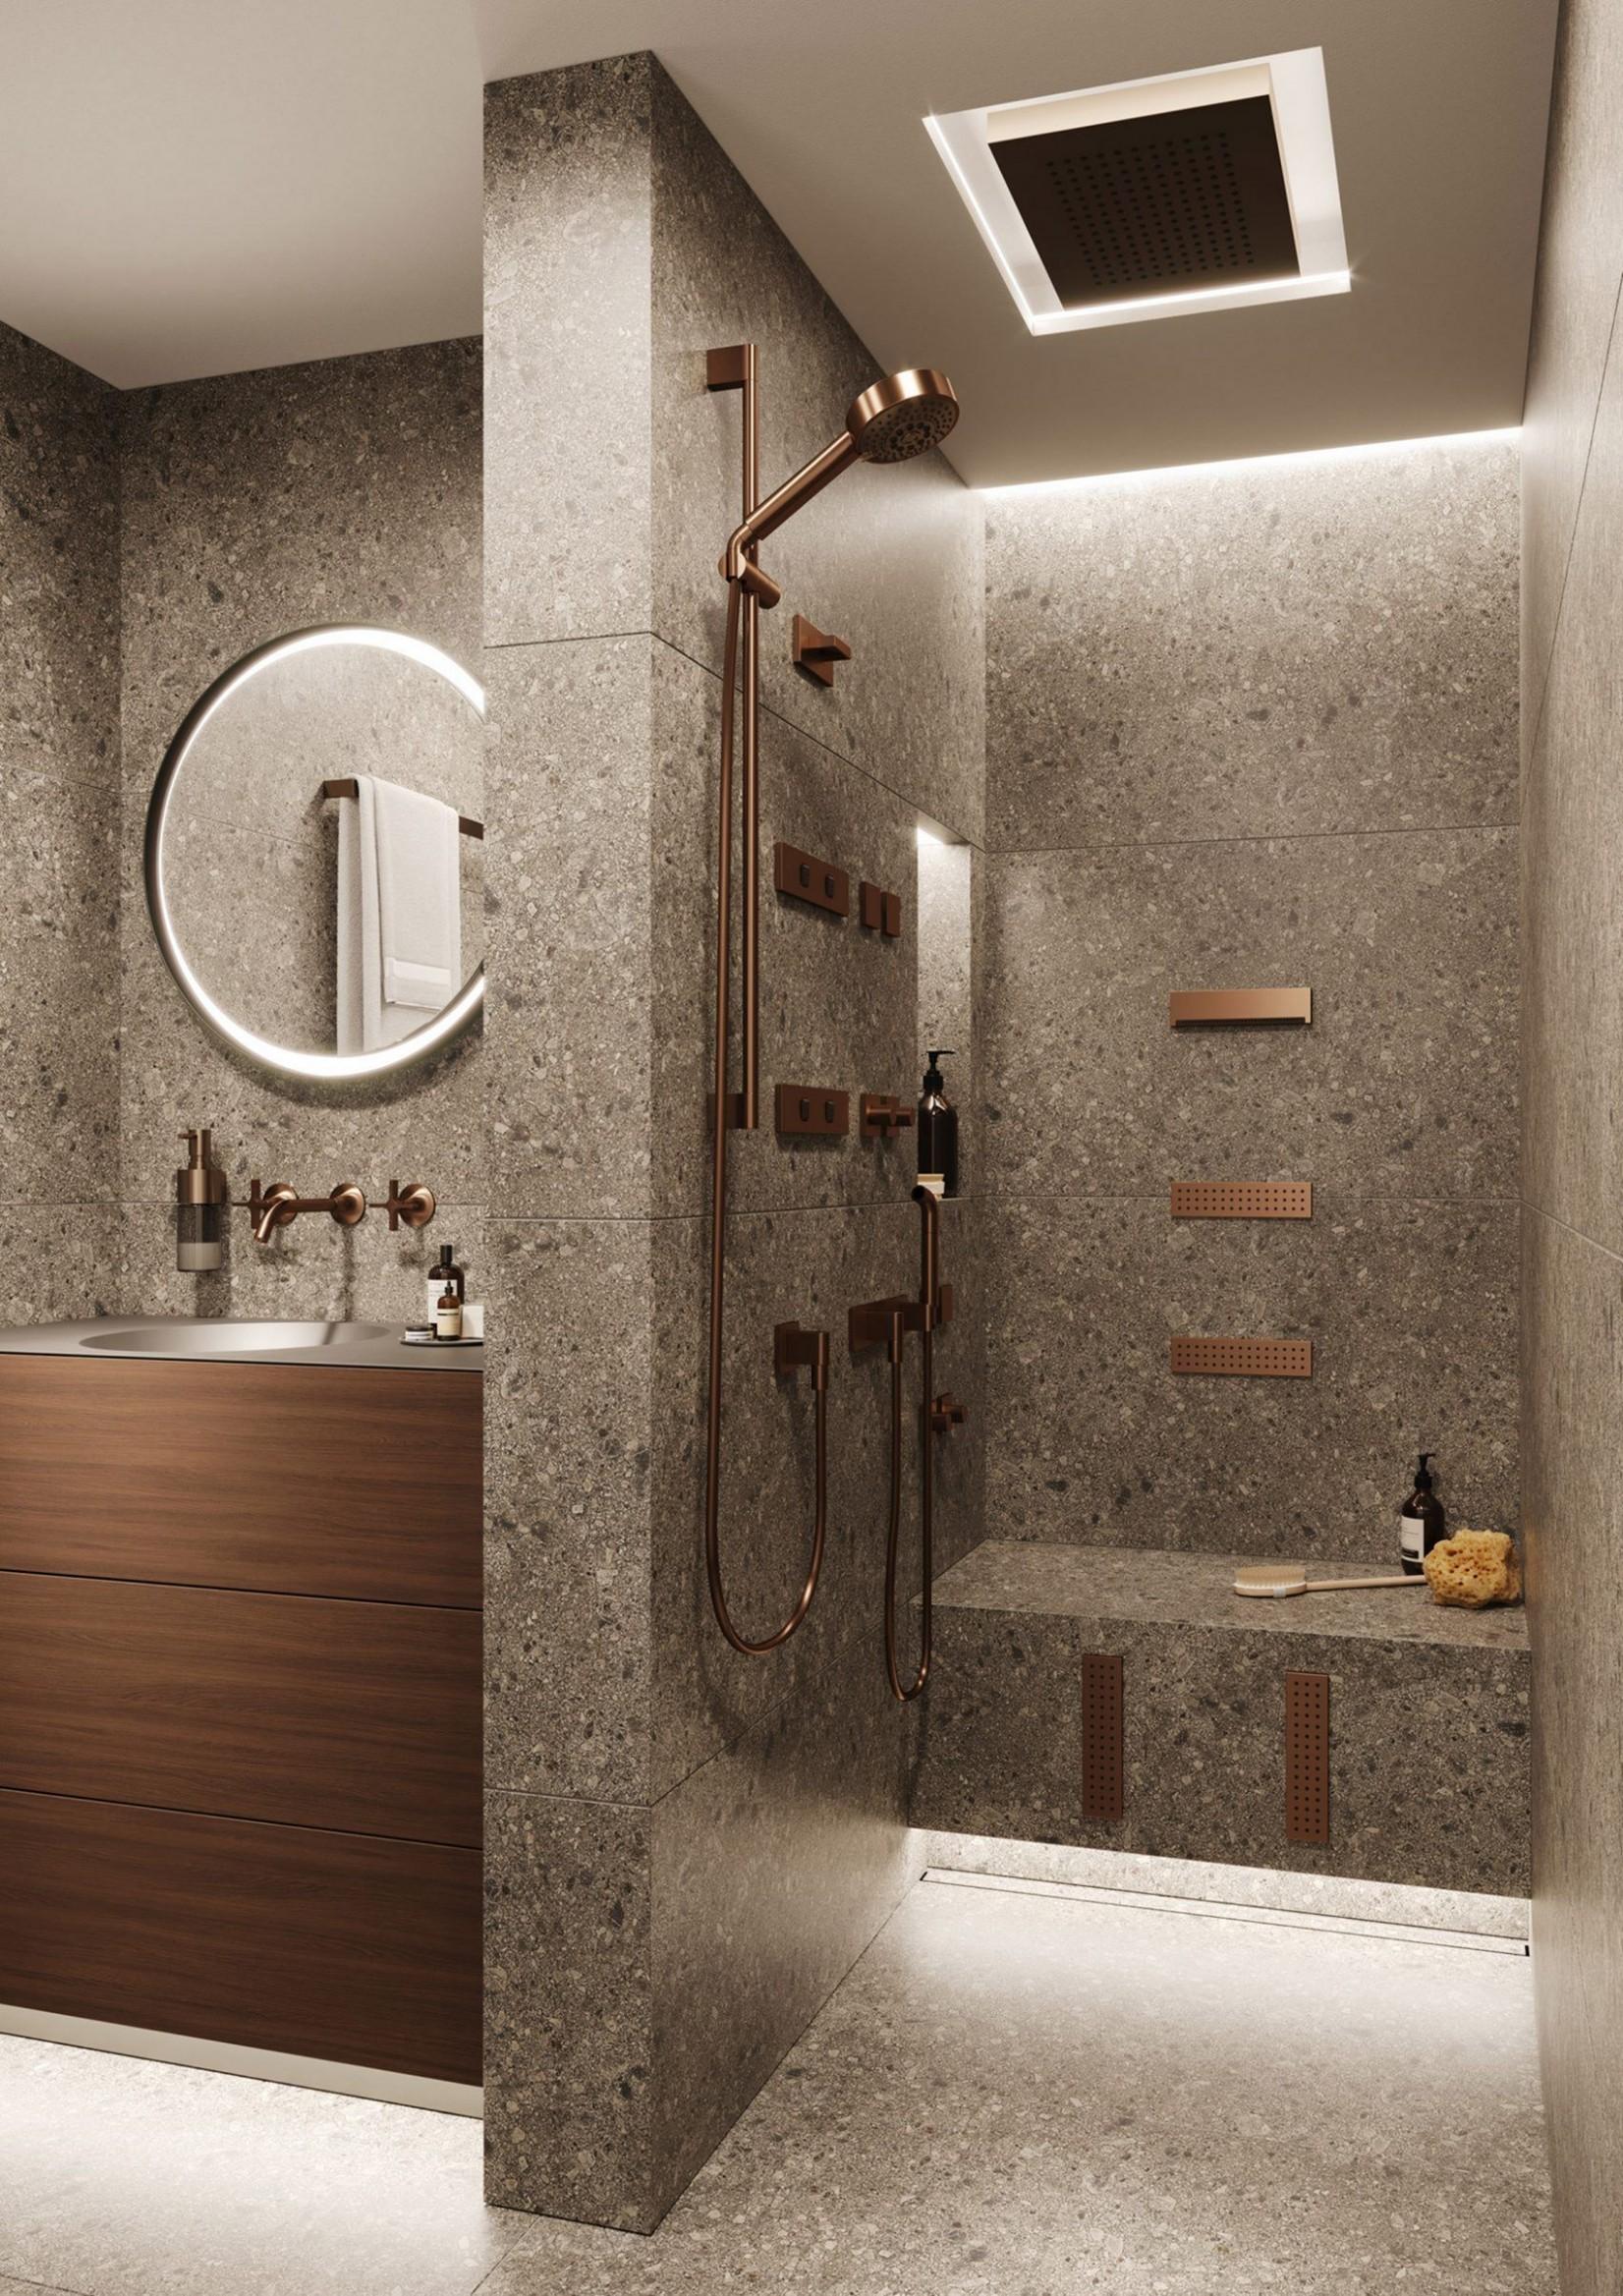 Small Bathroom Apartment Design Ideas 12  Bathroom design small  - Apartment Washroom Design